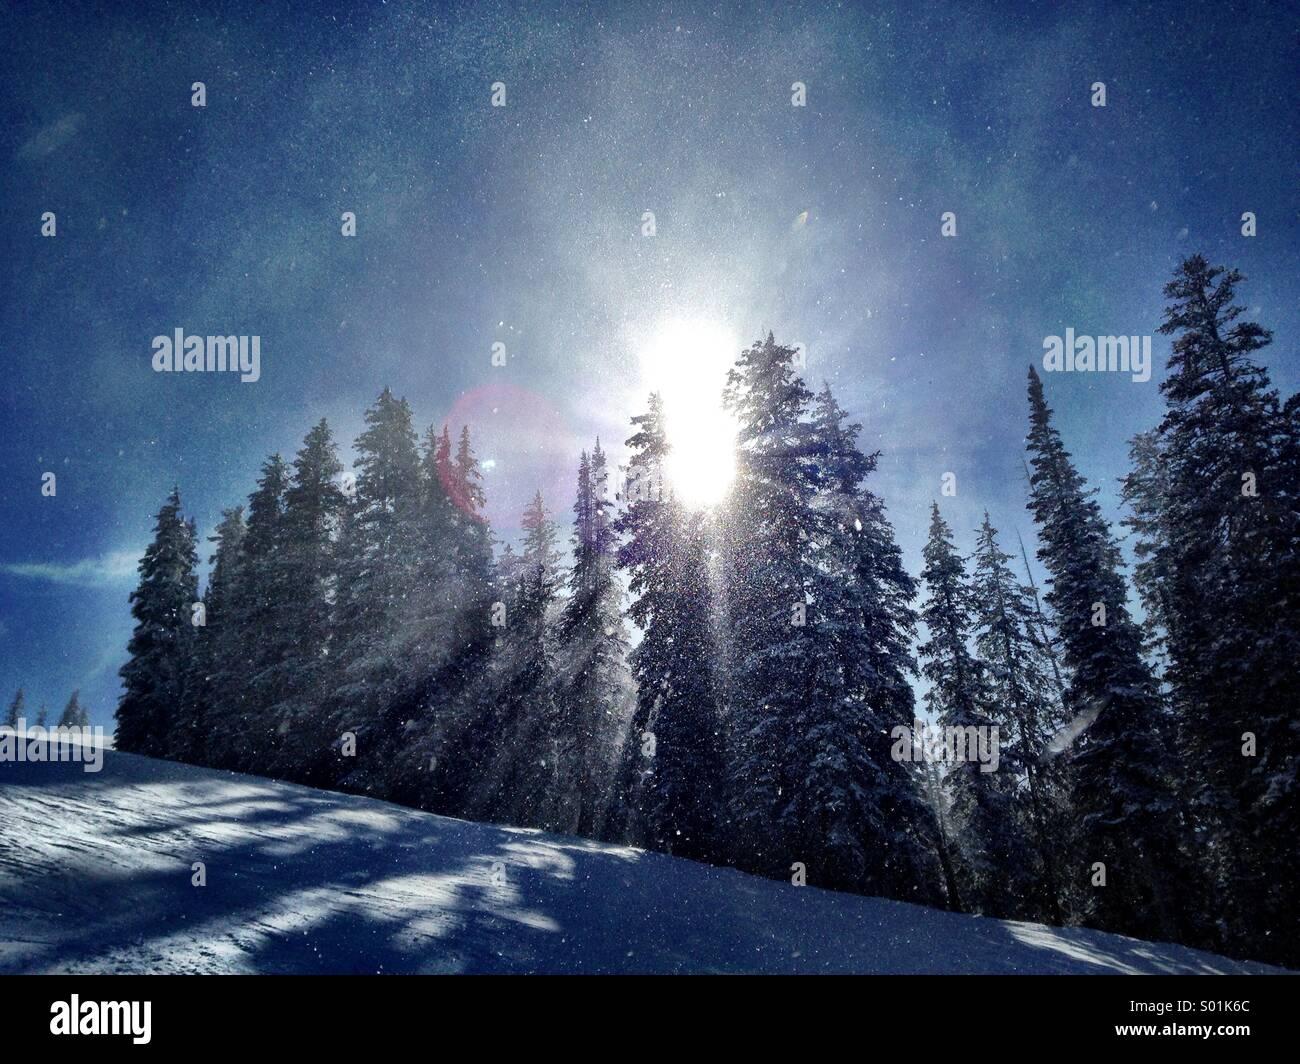 Crystalline snow sparkles in the sunlight in wintery Utah. - Stock Image